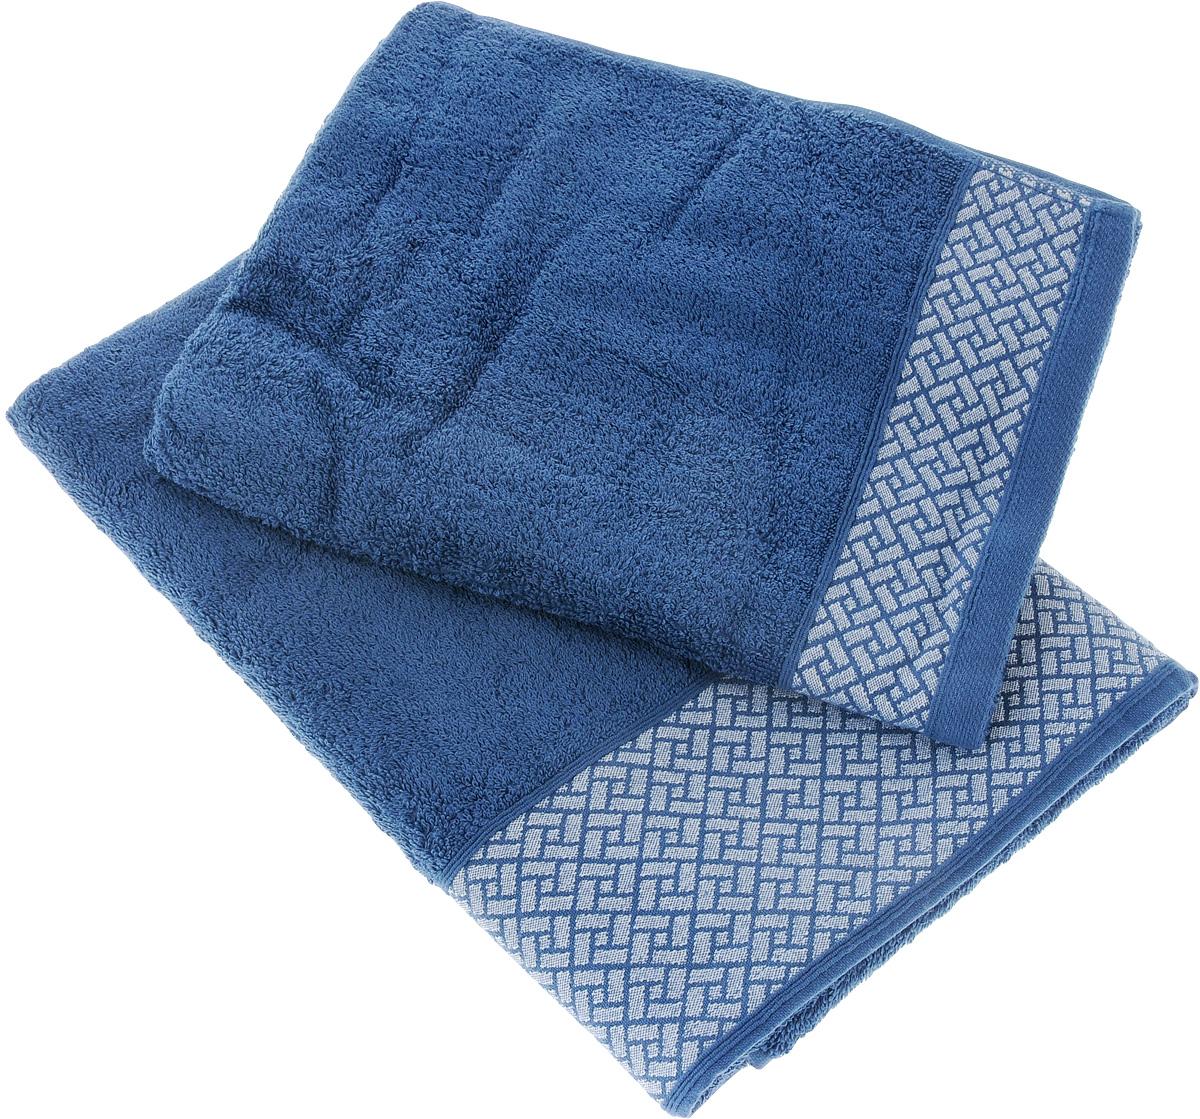 "Набор полотенец Tete-a-Tete ""Лабиринт"", цвет: синий, 2 шт. УНП-105"